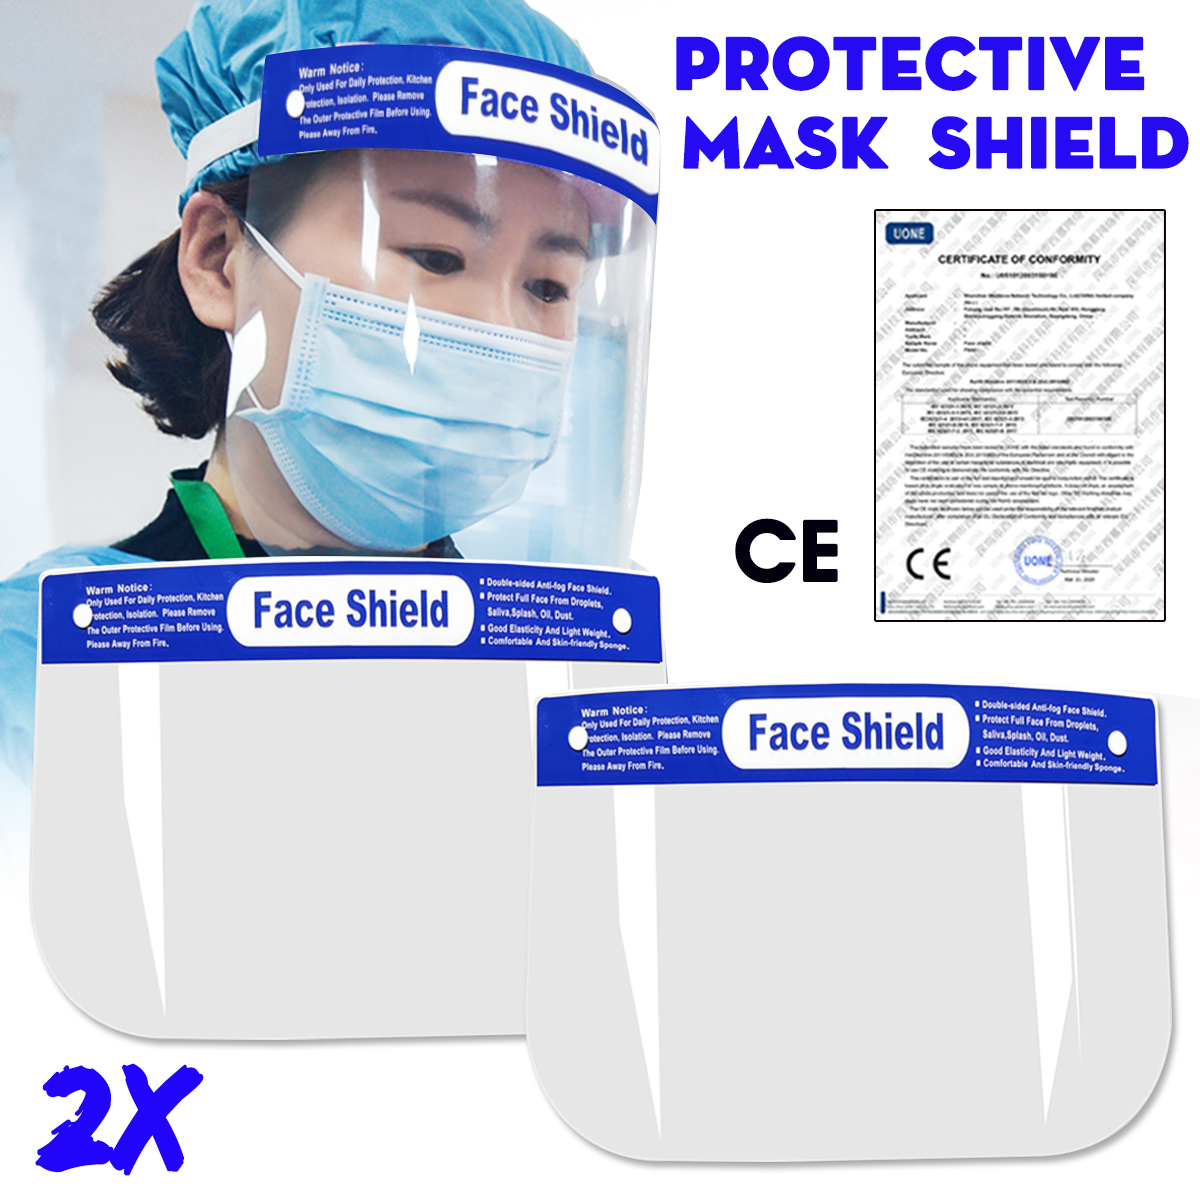 10 Small Kids Children Safety Full Face Shield Anti-Fog Protector Anti-Splash